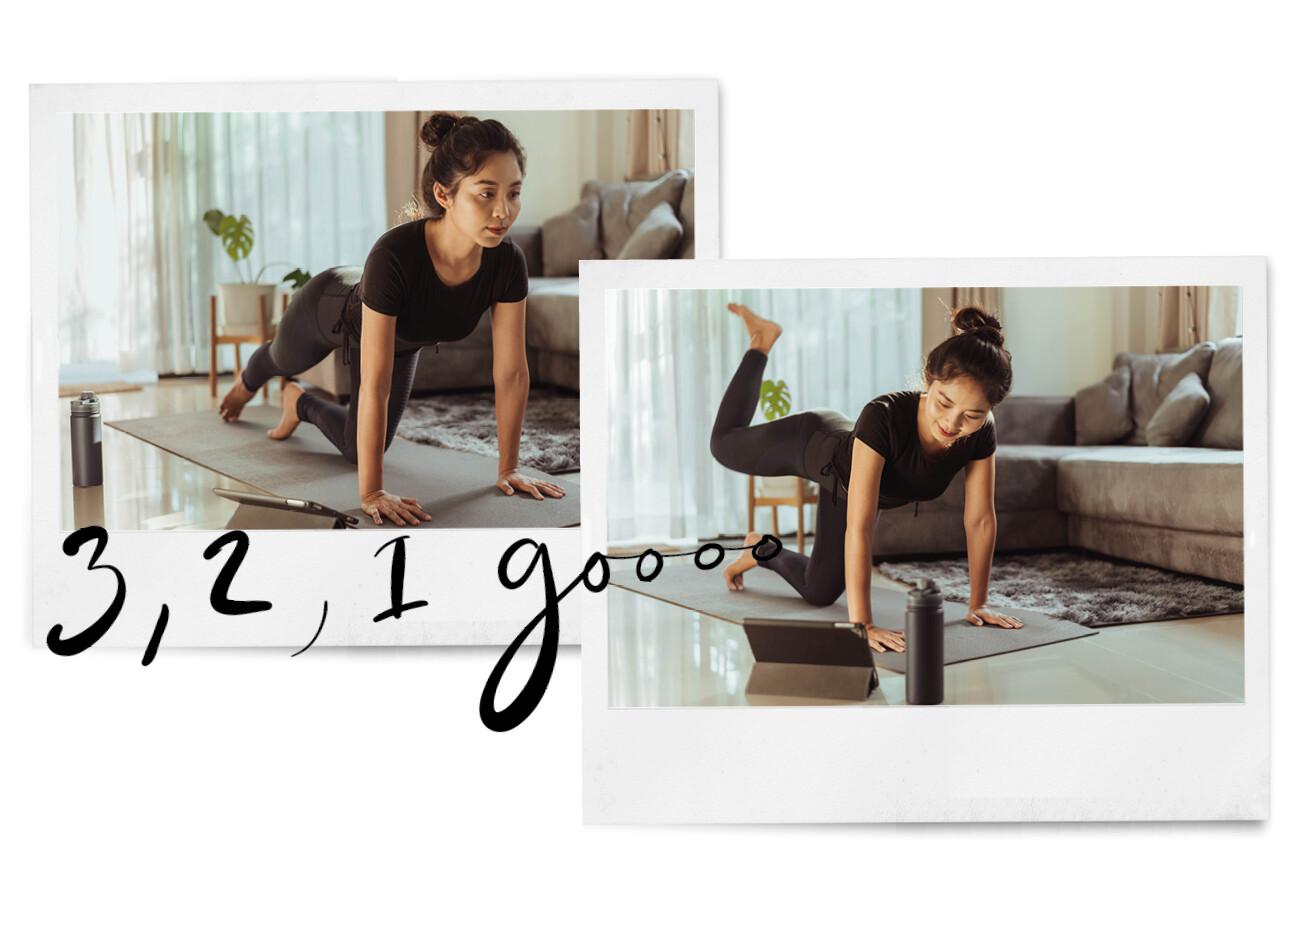 De 5 beste booty oefeningen die je thuis kan doen